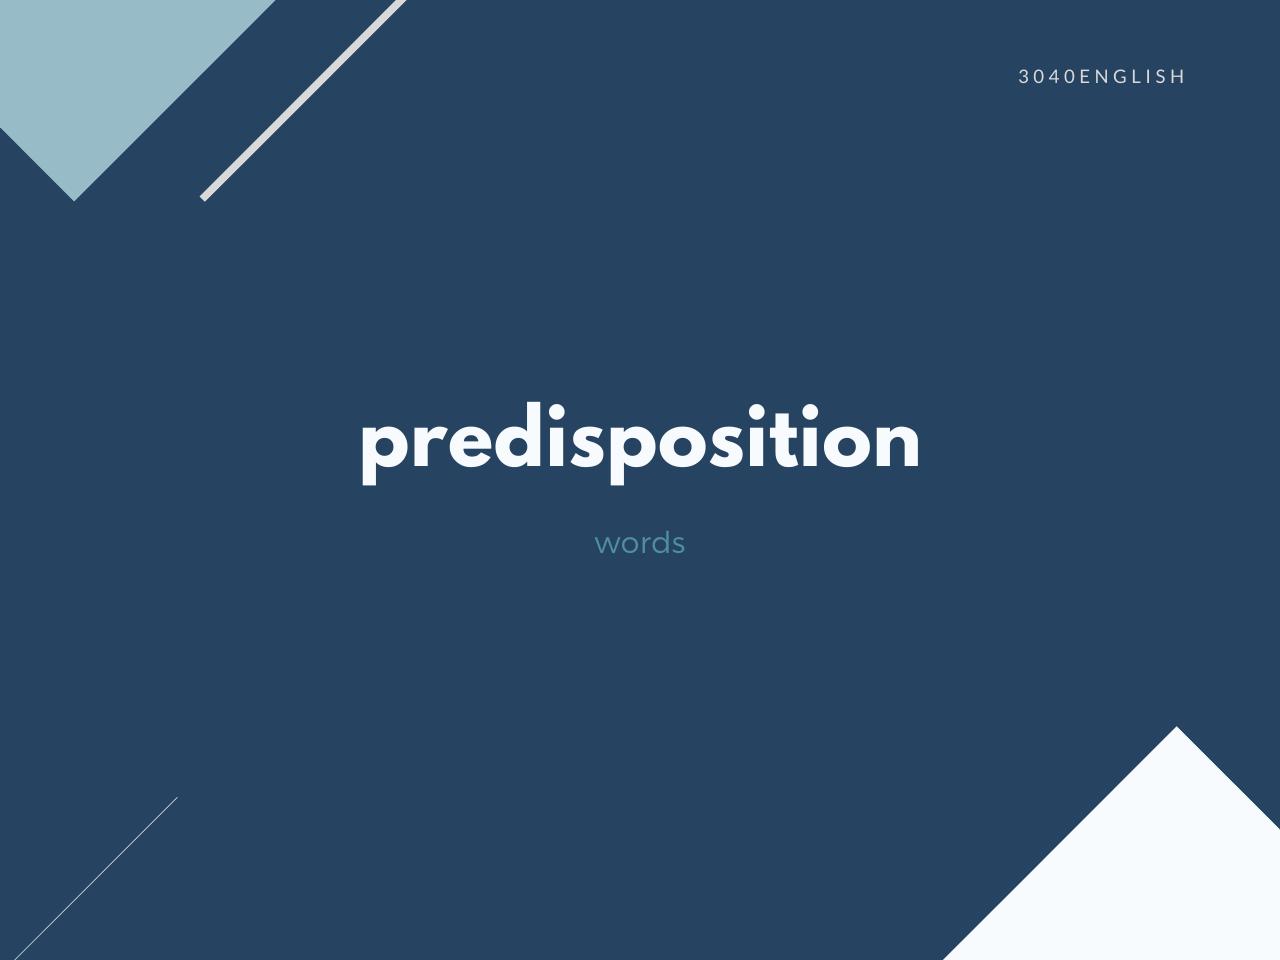 predisposition の意味と簡単な使い方【音読用例文あり】